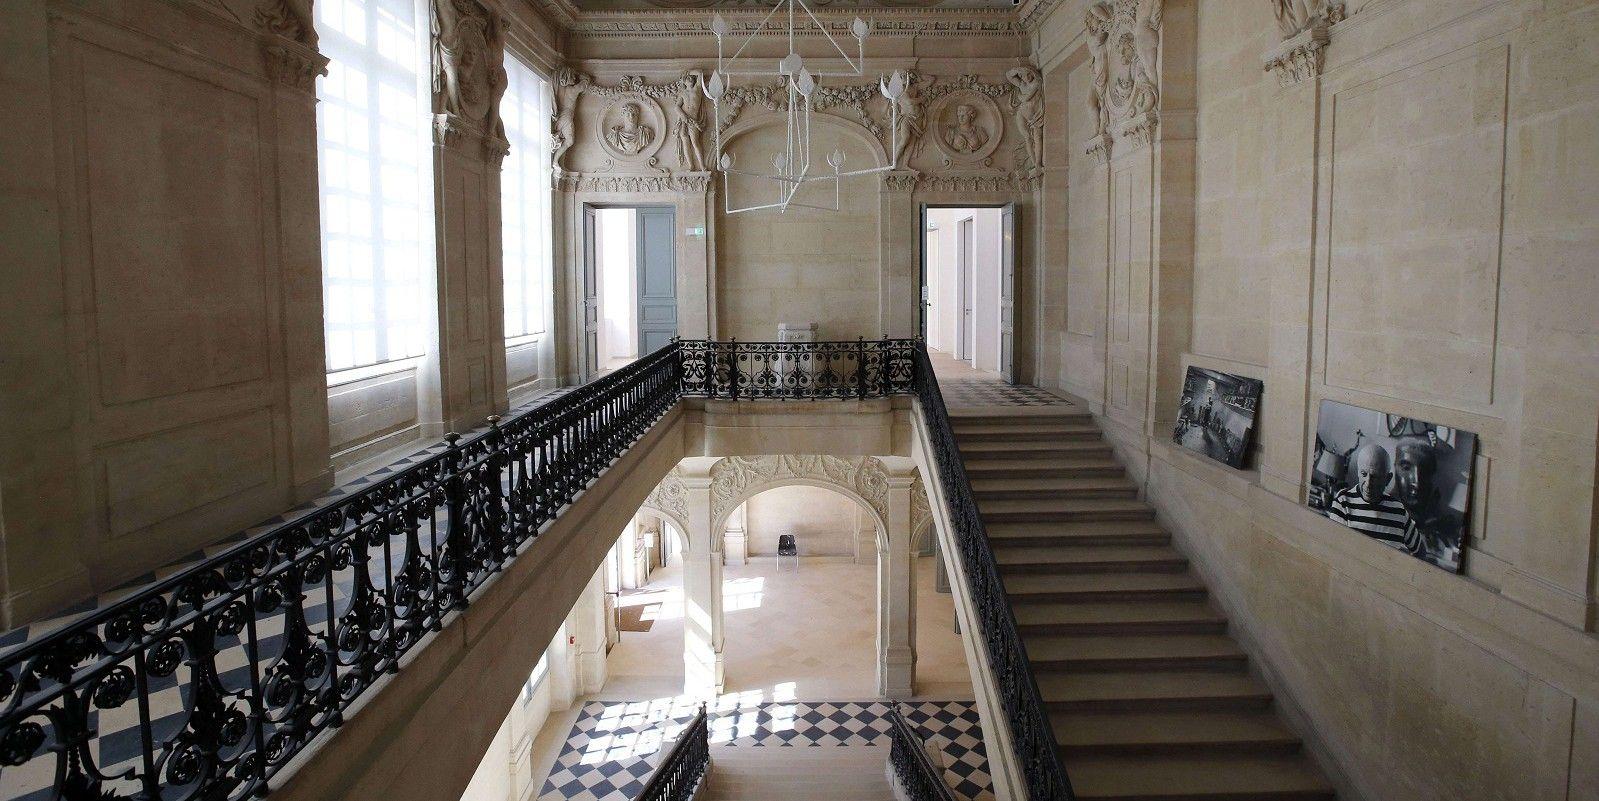 Hôtel Aubert de Fontenay dit Hôtel Salé (1659) 5, rue de Thorigny Paris 75003. Grand escalier.